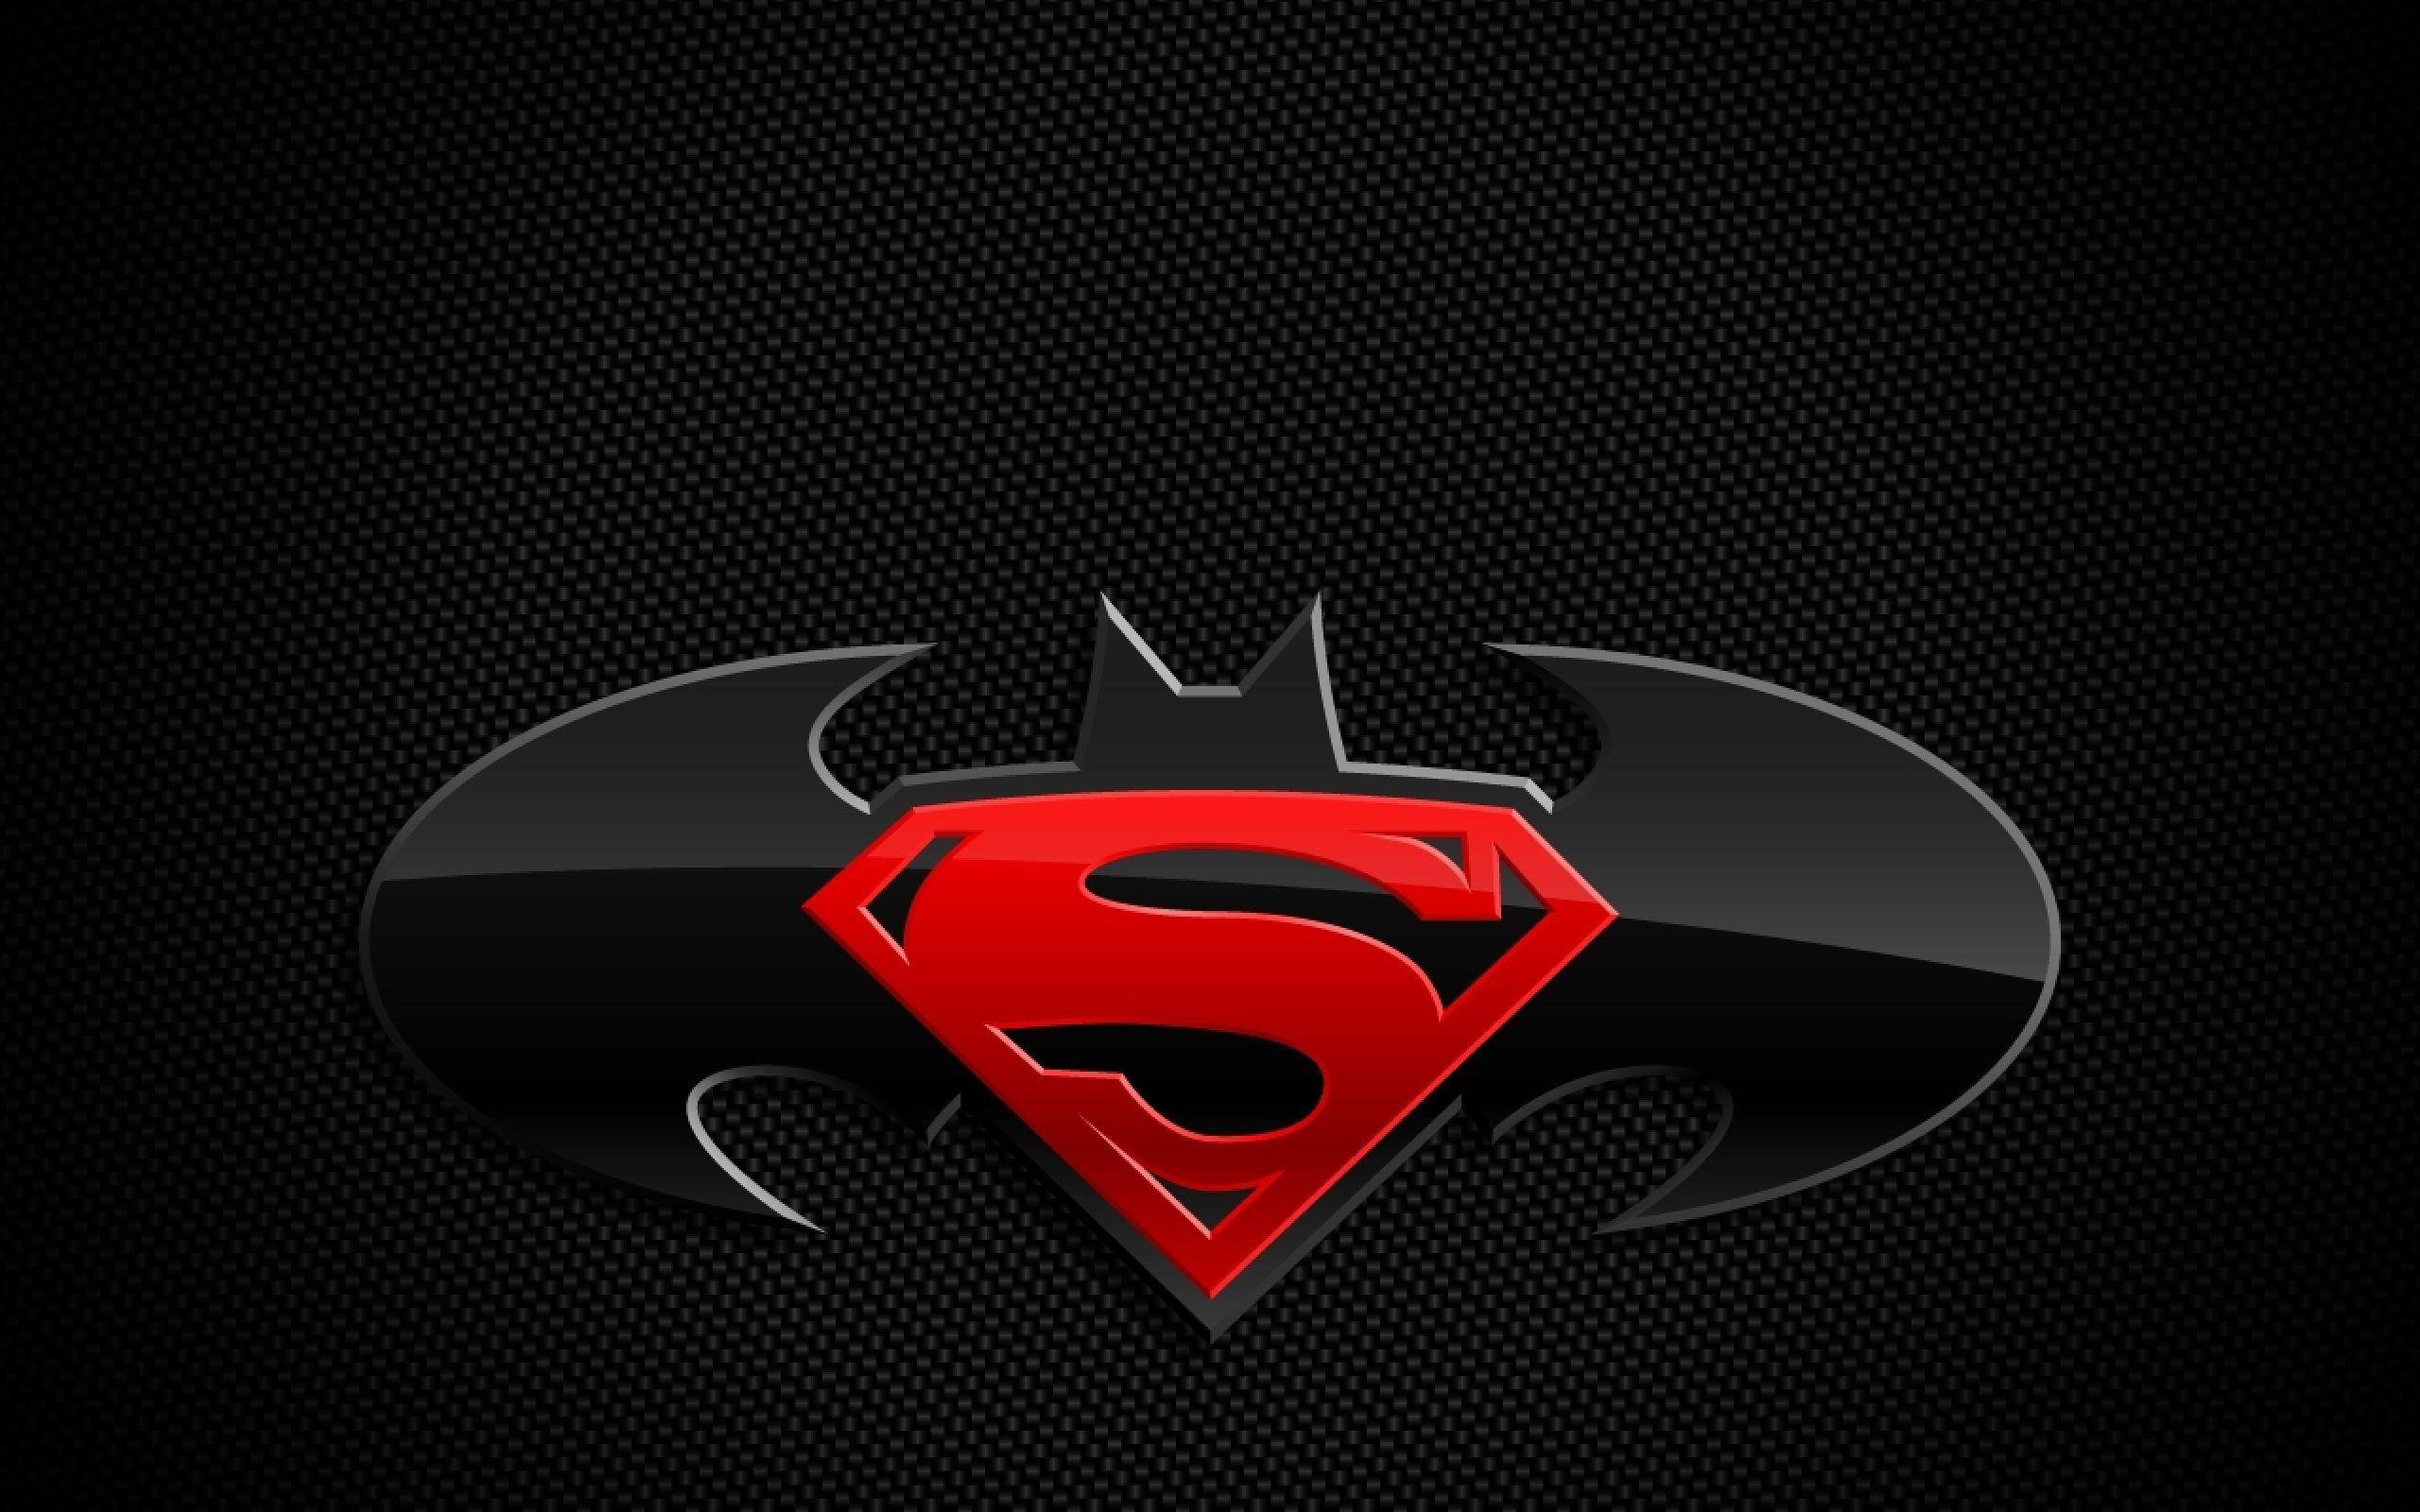 Superman Wallpaper Superman Wallpaper Logo Superman Hd Wallpaper